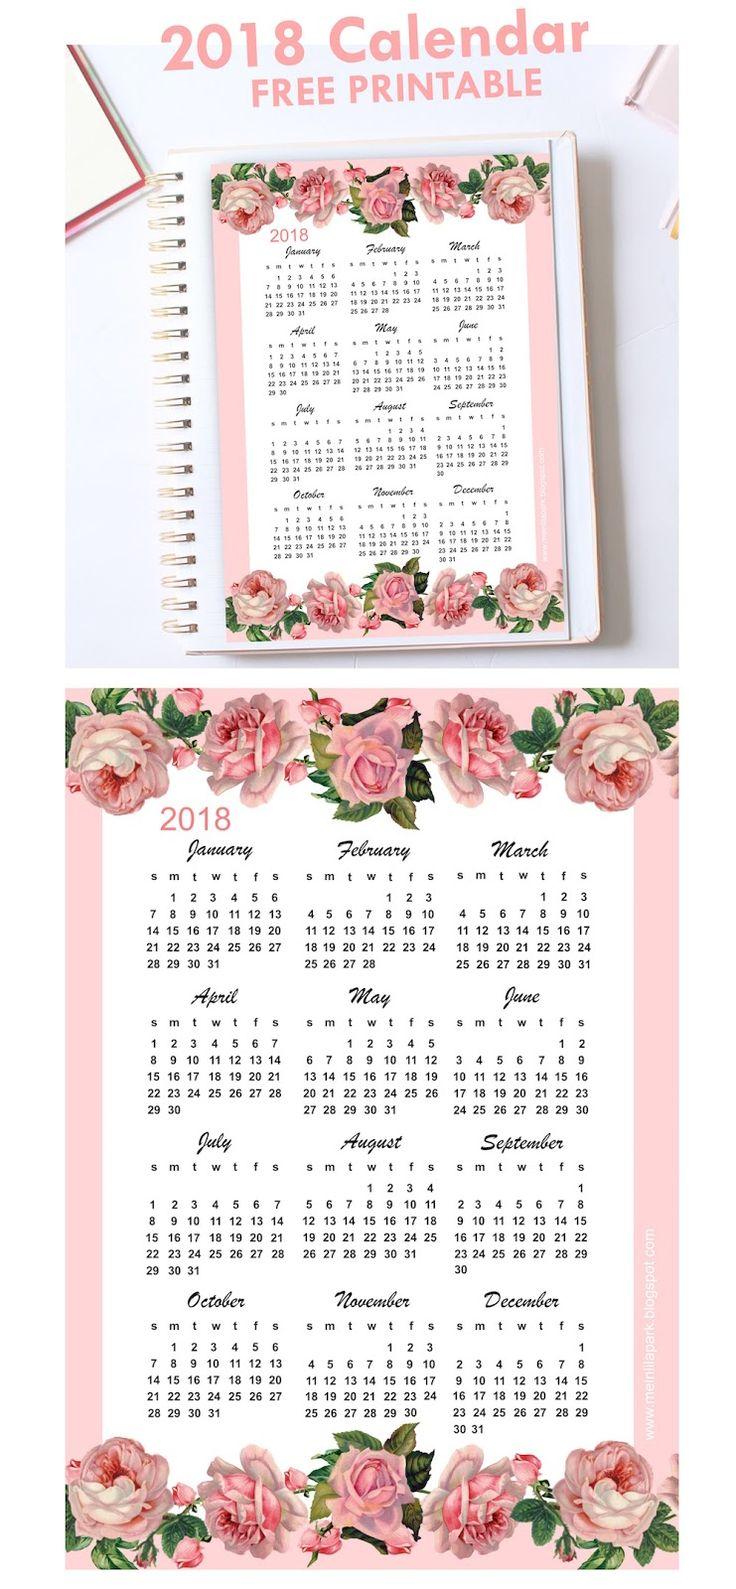 FREE printable 2018 rose calendar